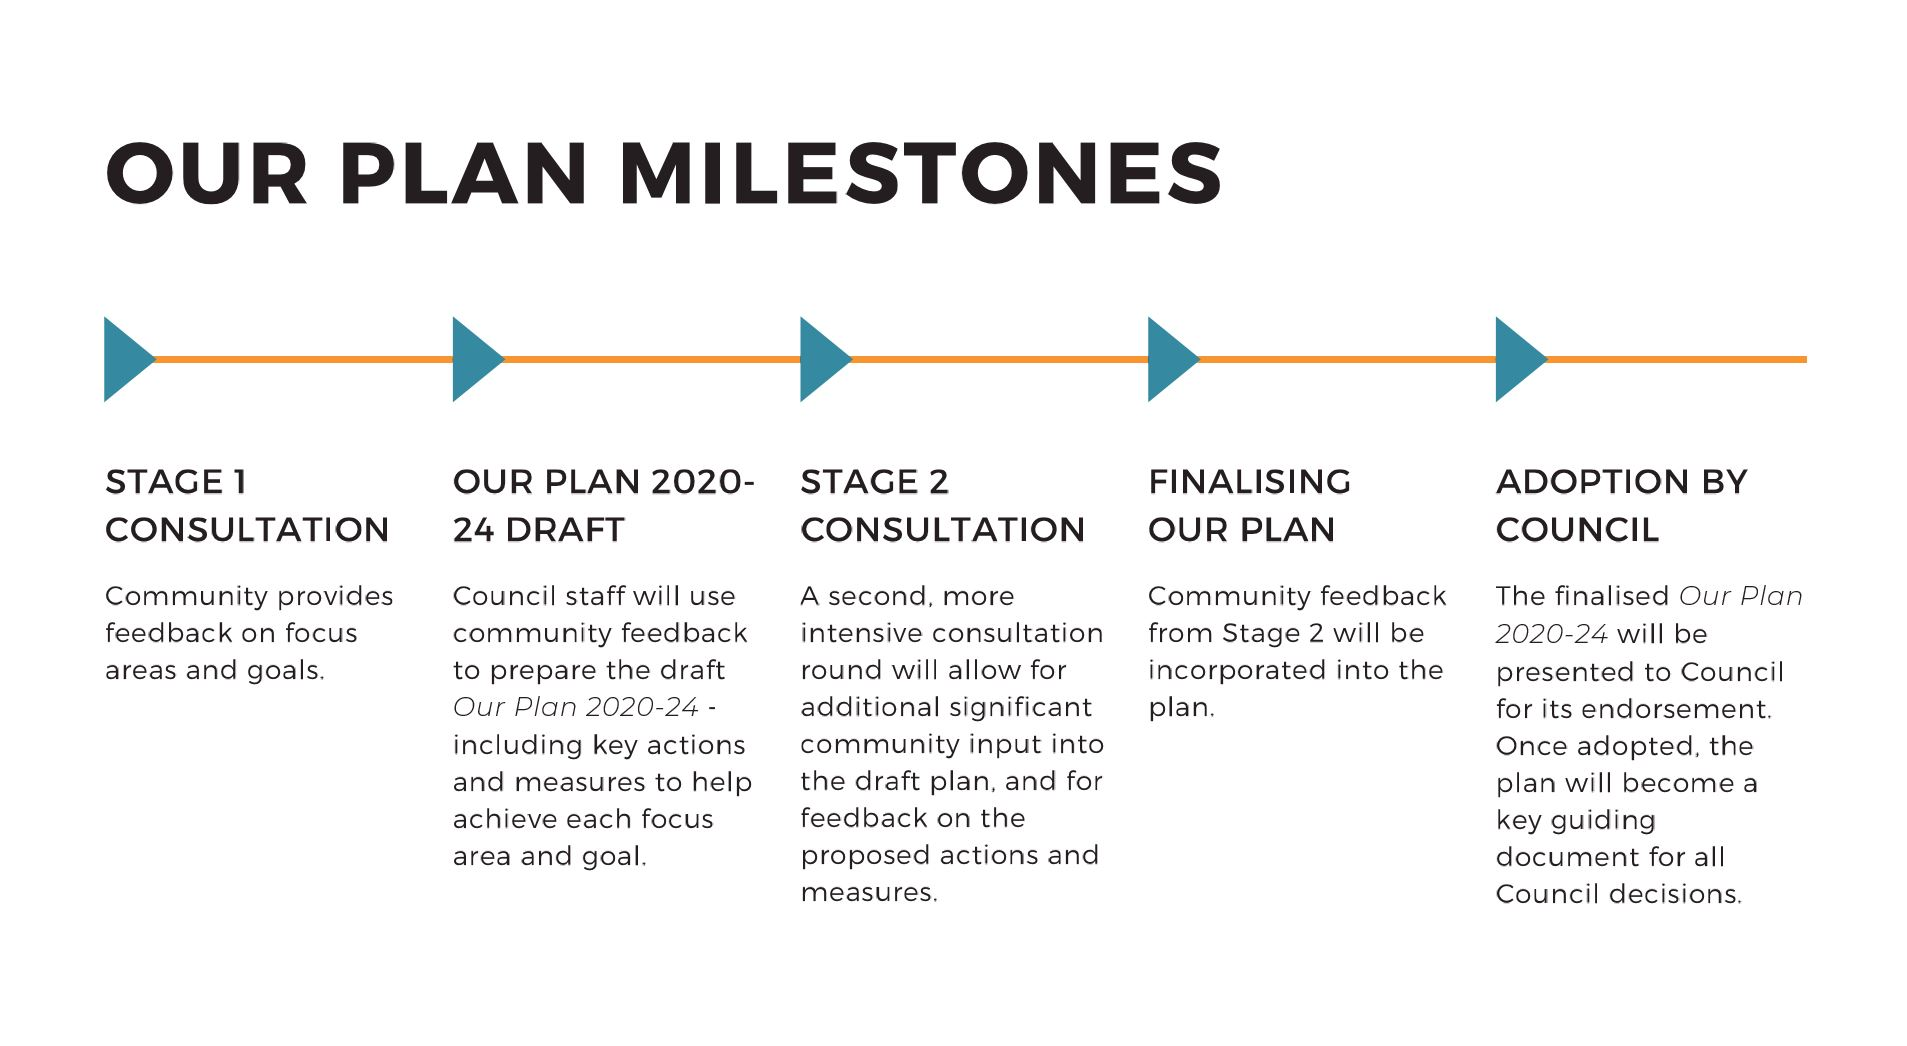 Our Plan Milestones